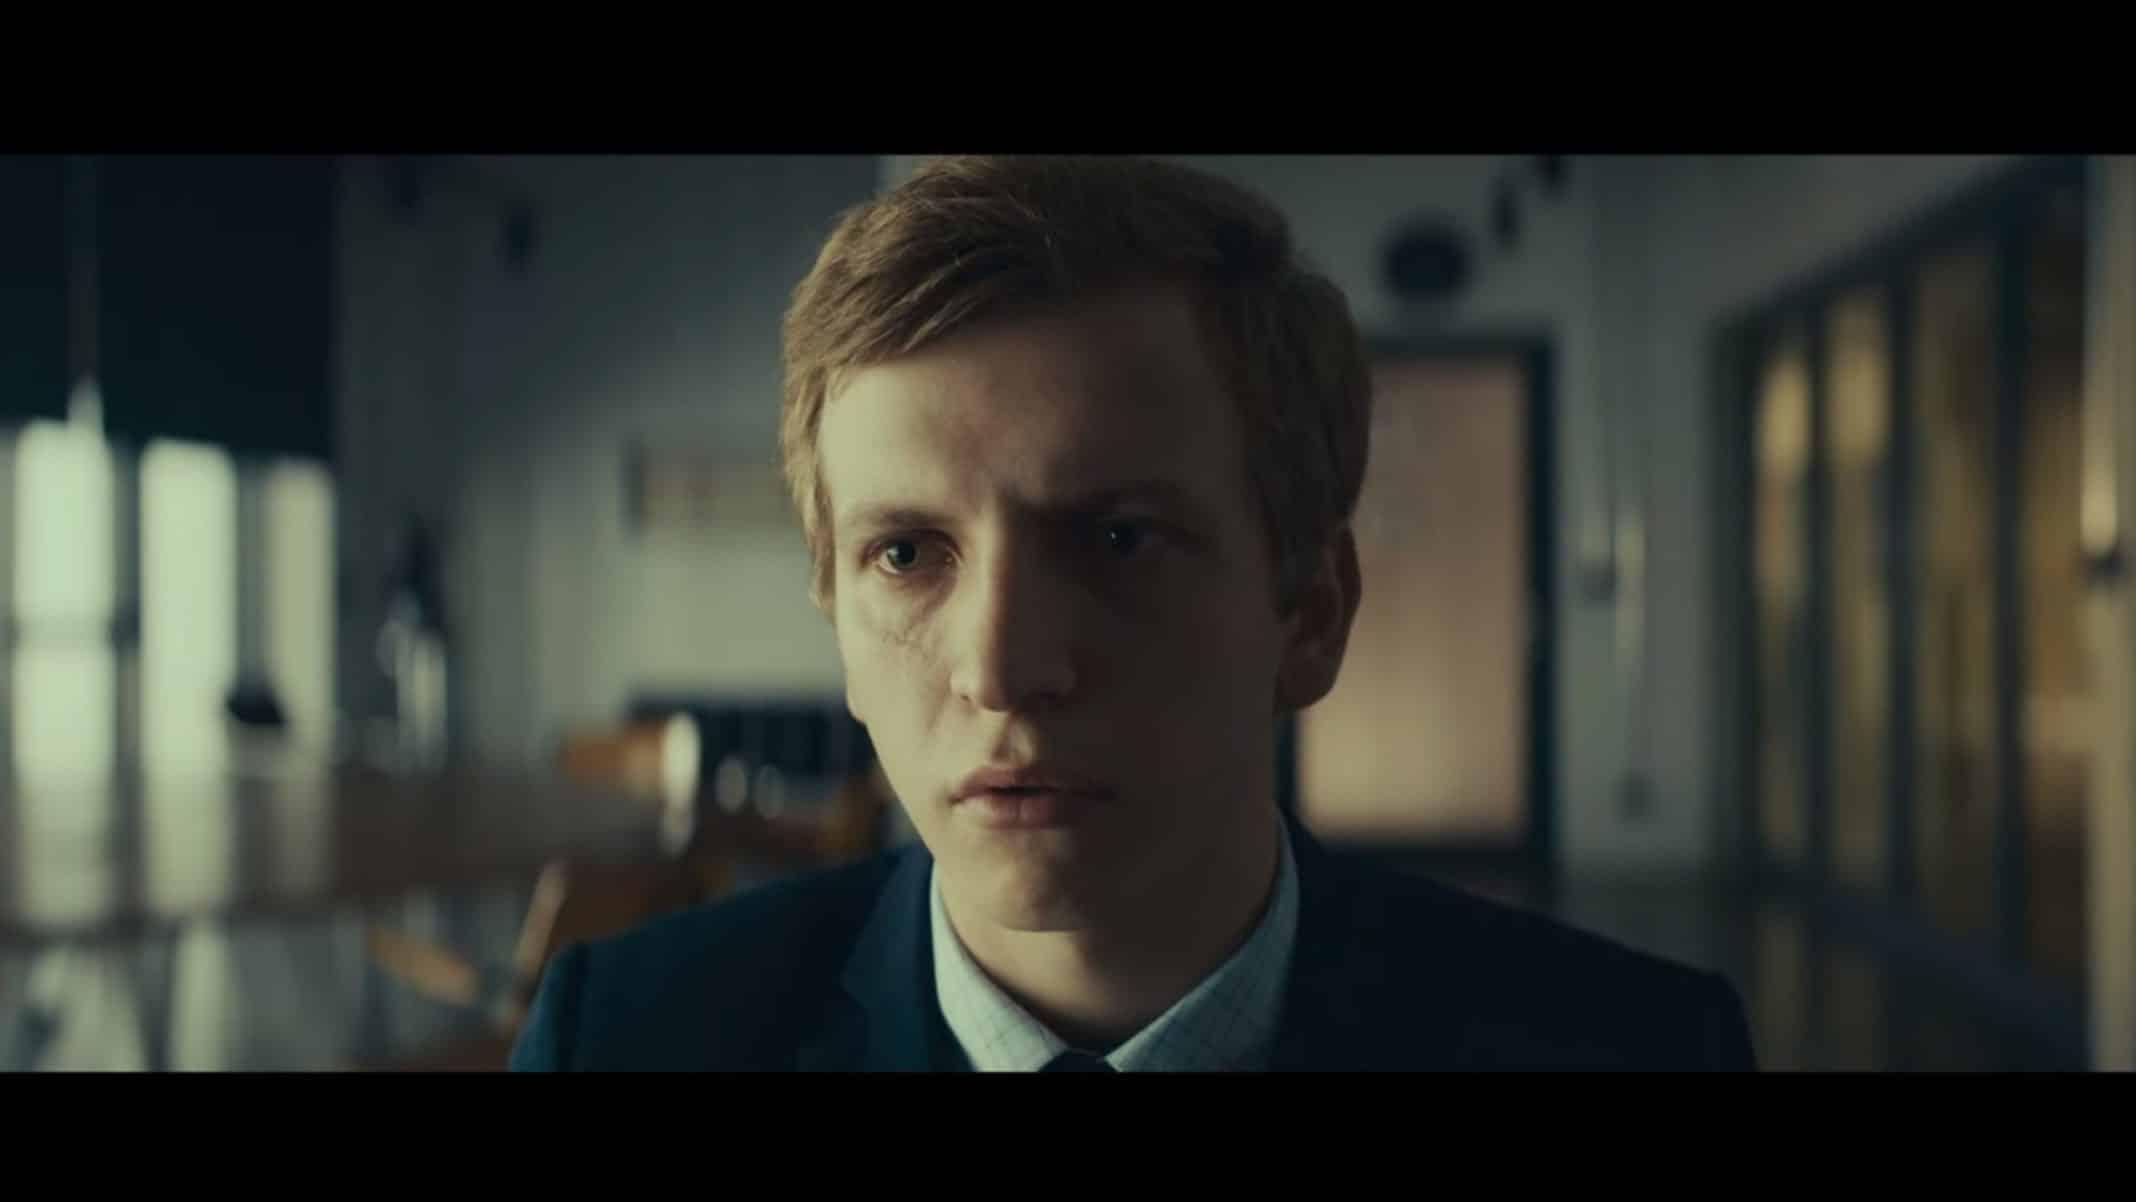 Tomek (Maciej Musialowski) at school.